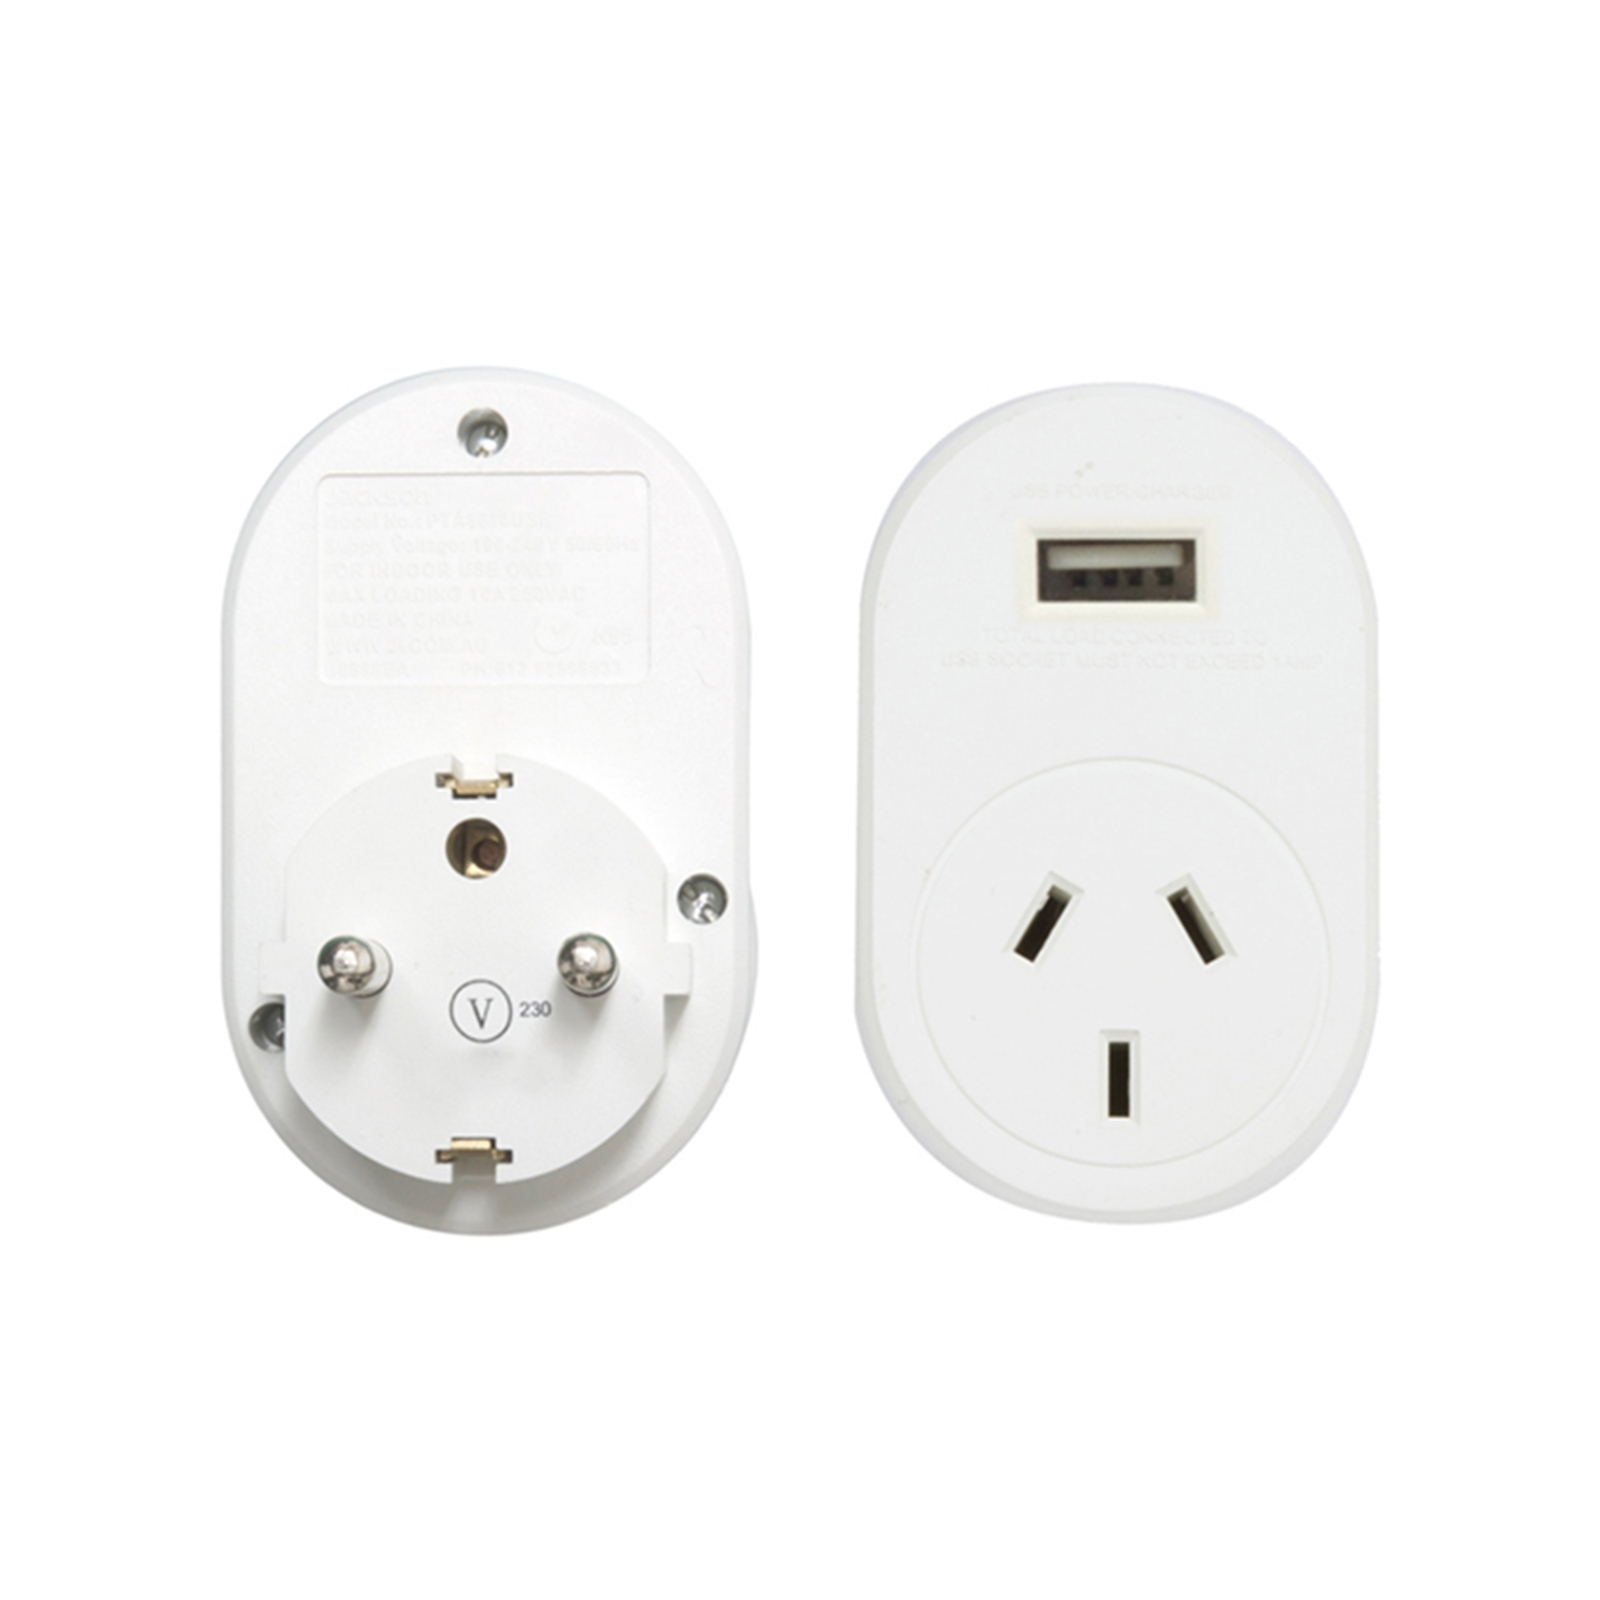 Jackson International Travel Adaptor + USB Charging Outlet  For Australian & New Zealand Travellers